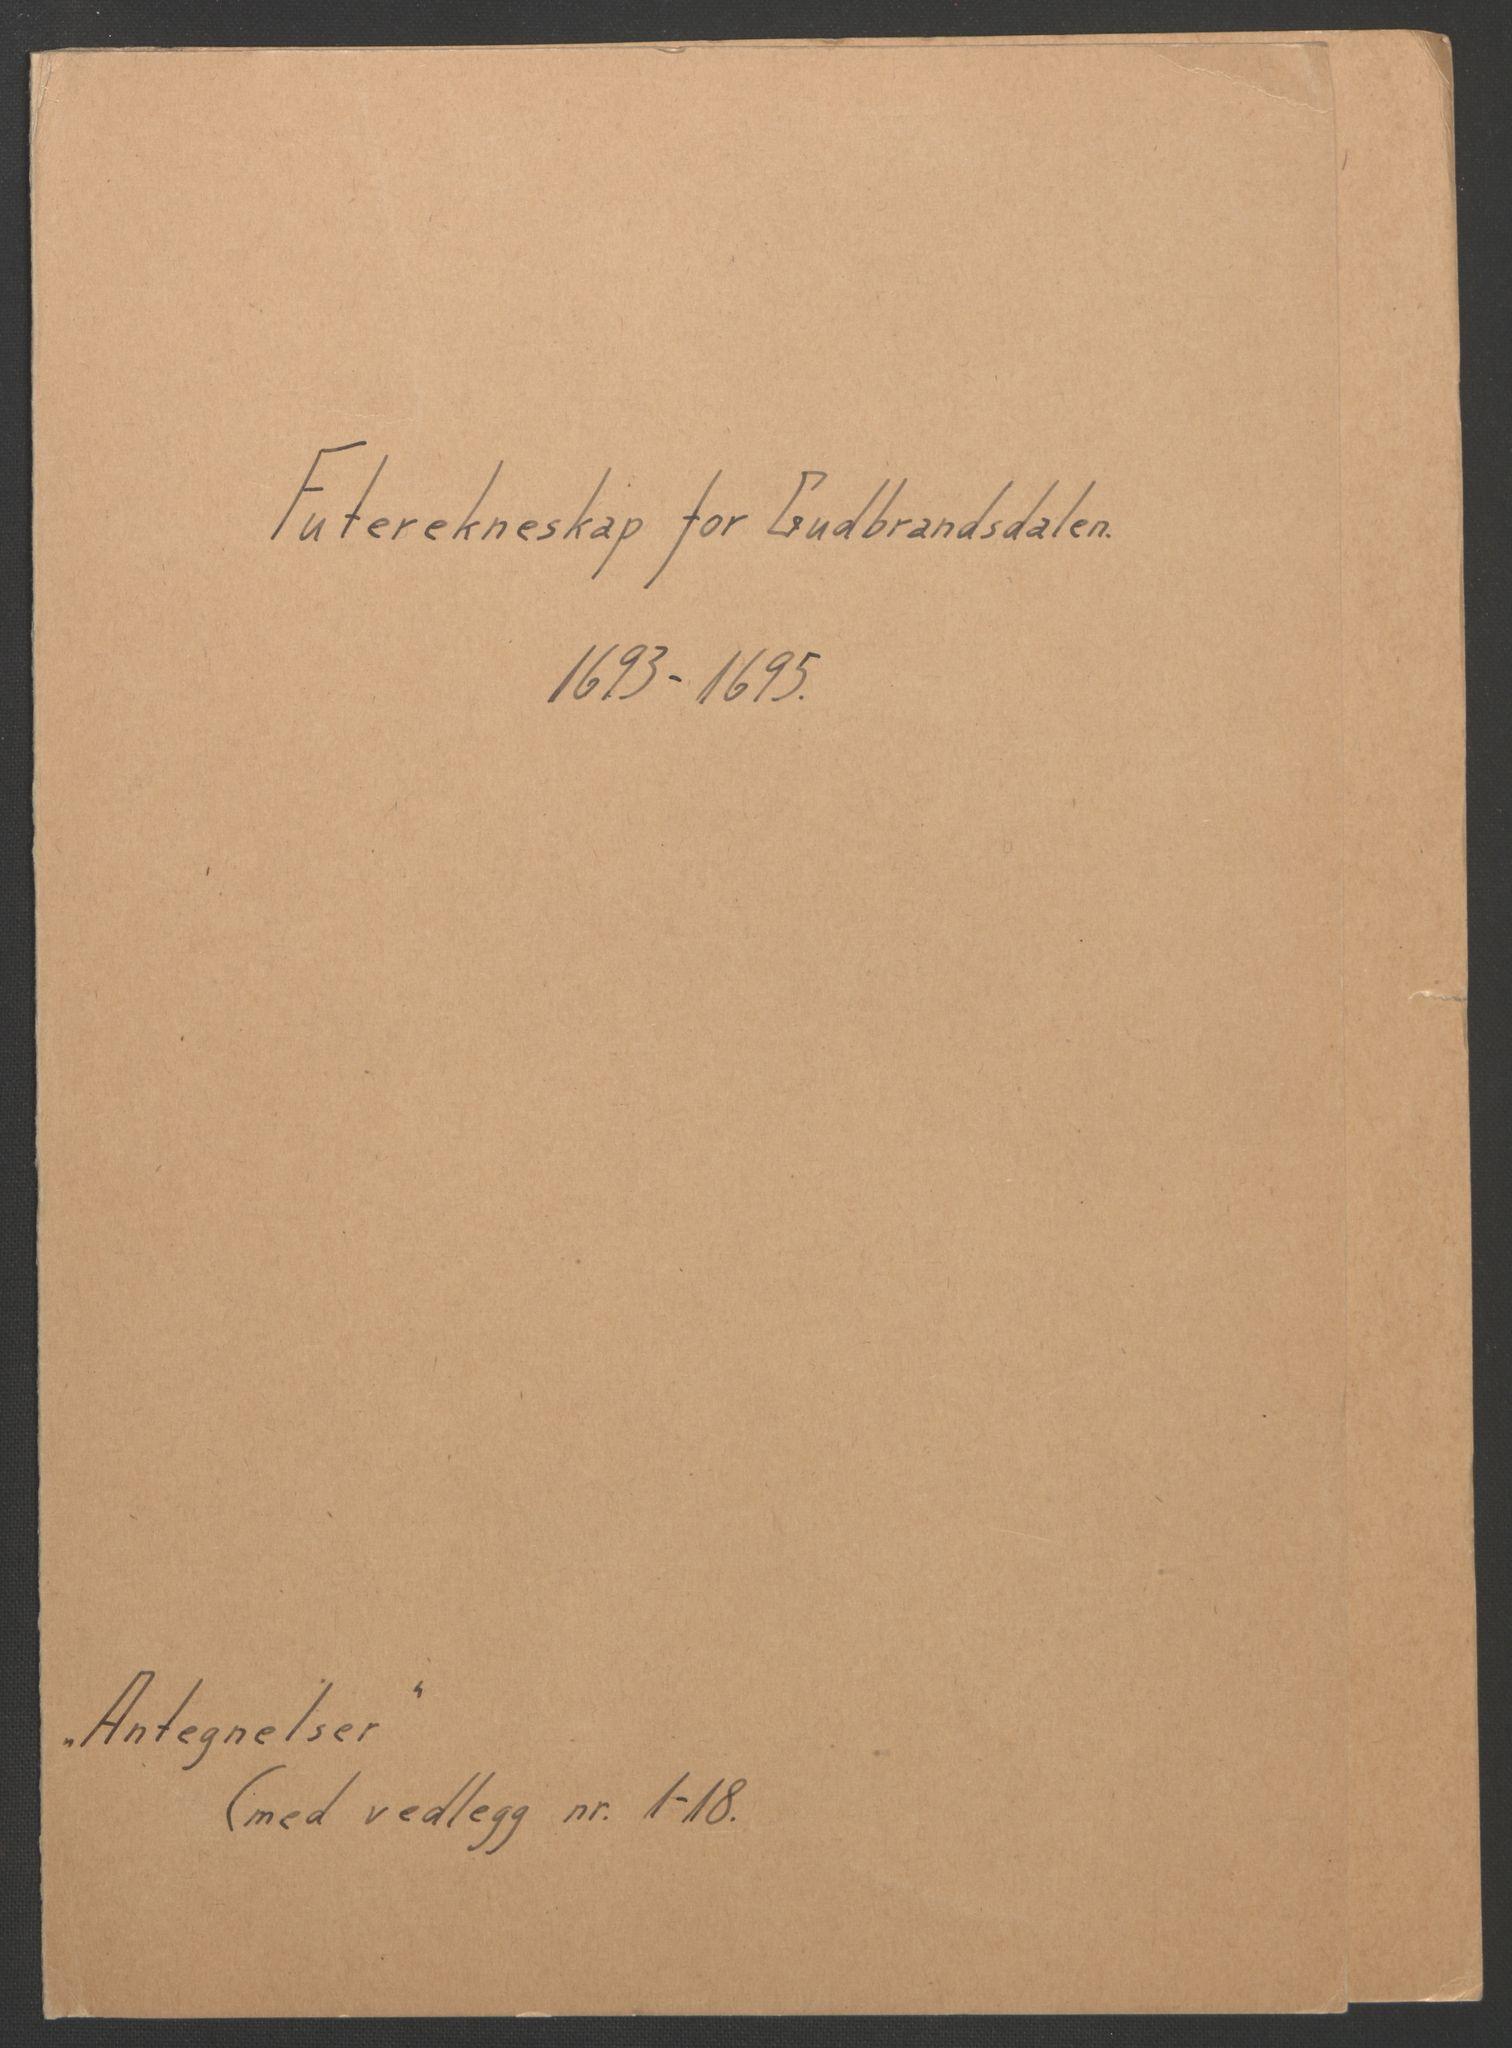 RA, Rentekammeret inntil 1814, Reviderte regnskaper, Fogderegnskap, R17/L1169: Fogderegnskap Gudbrandsdal, 1695, s. 190